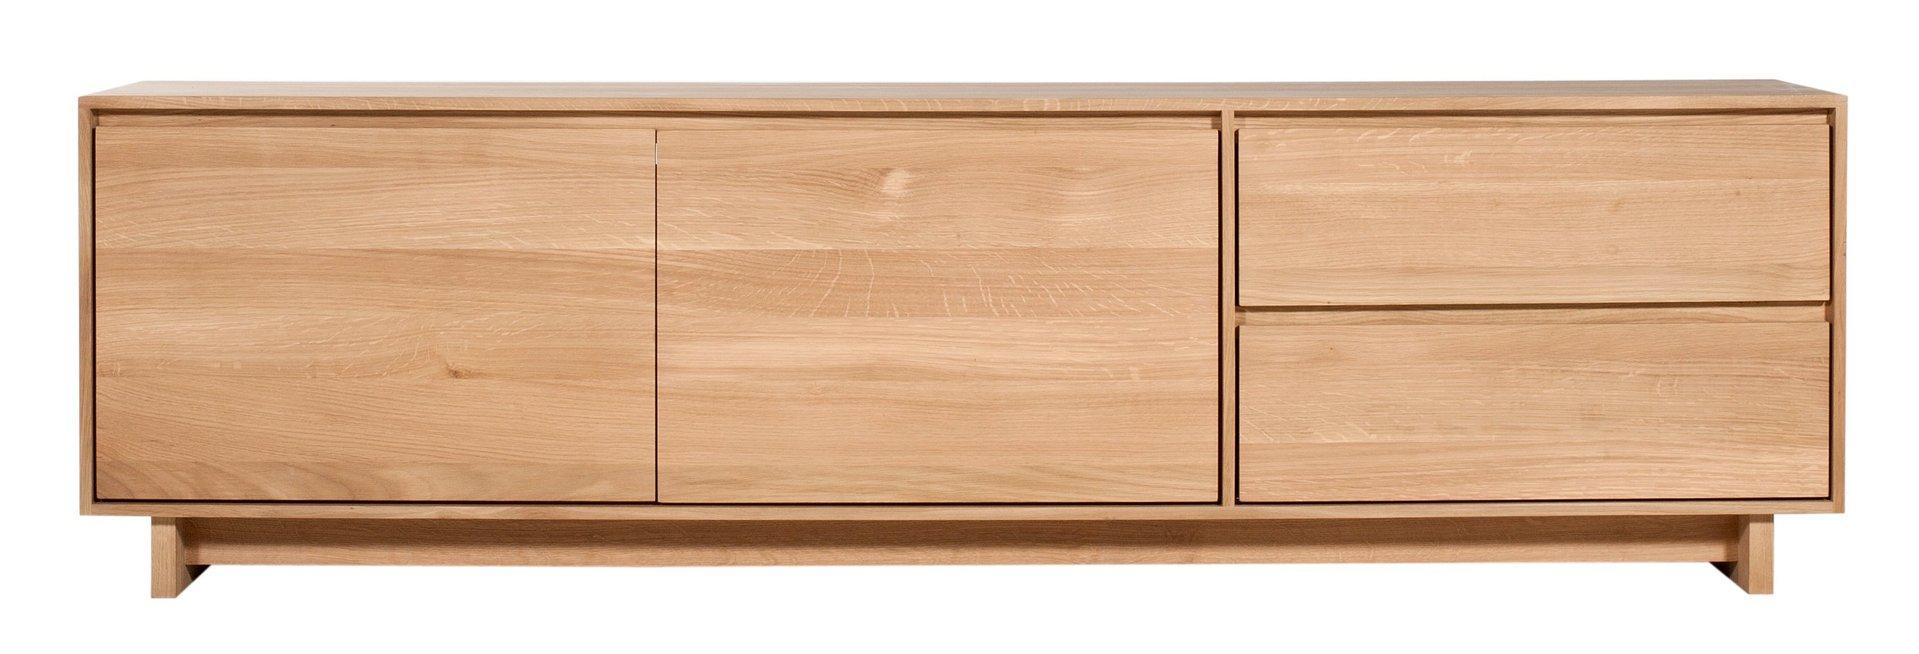 ethnicraft oak wave tv board mediaboard teakwoodstore24. Black Bedroom Furniture Sets. Home Design Ideas